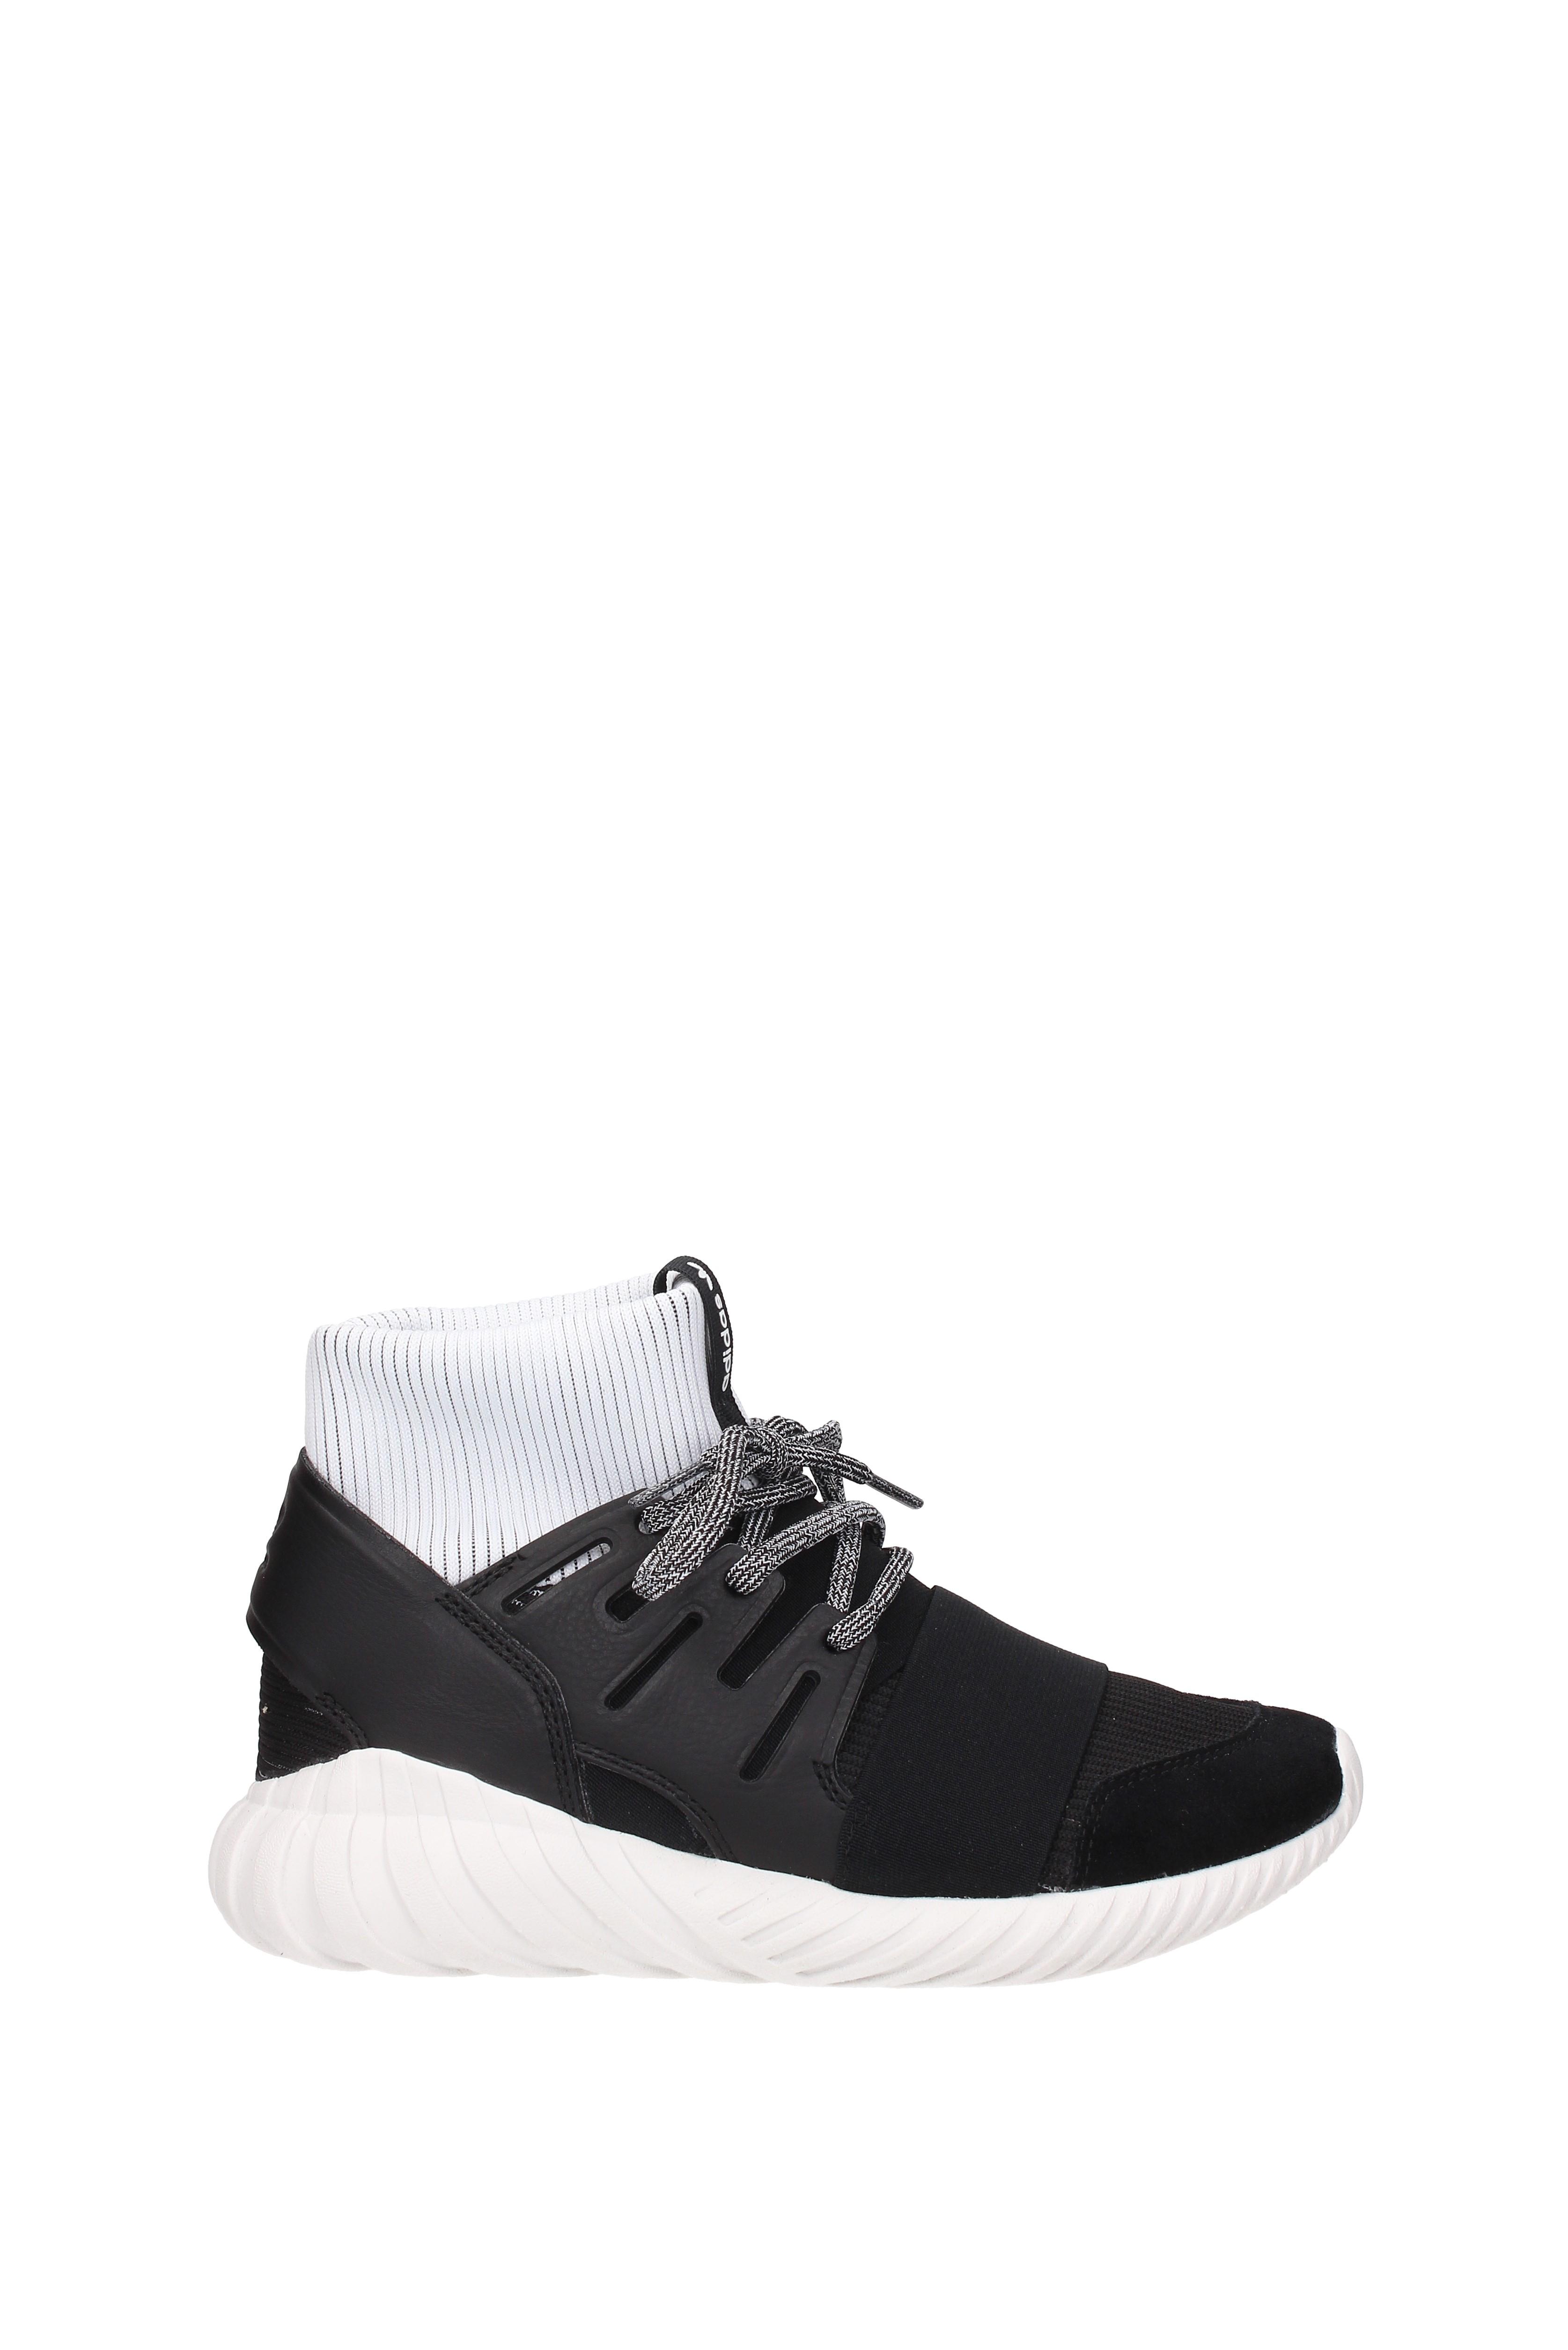 Schuhe adidas tubuläre doom männer männer doom - stoff (ba755) 4507a8